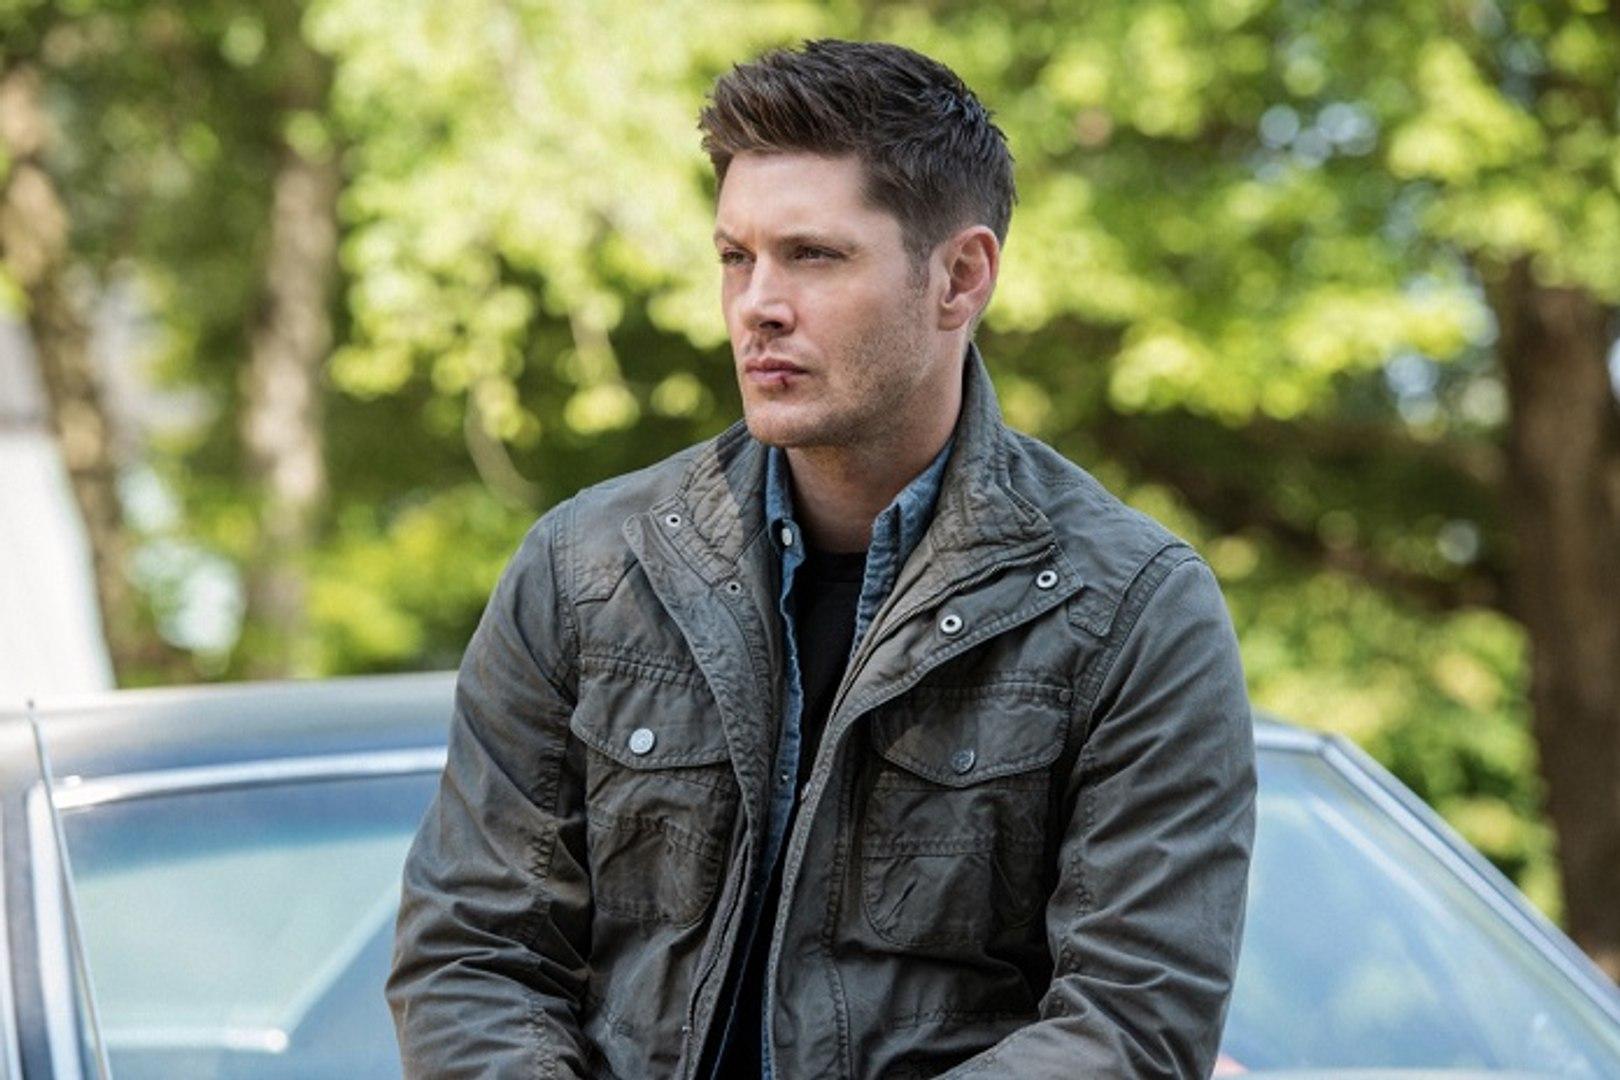 watch supernatural season 13 episode 1 online free putlockers